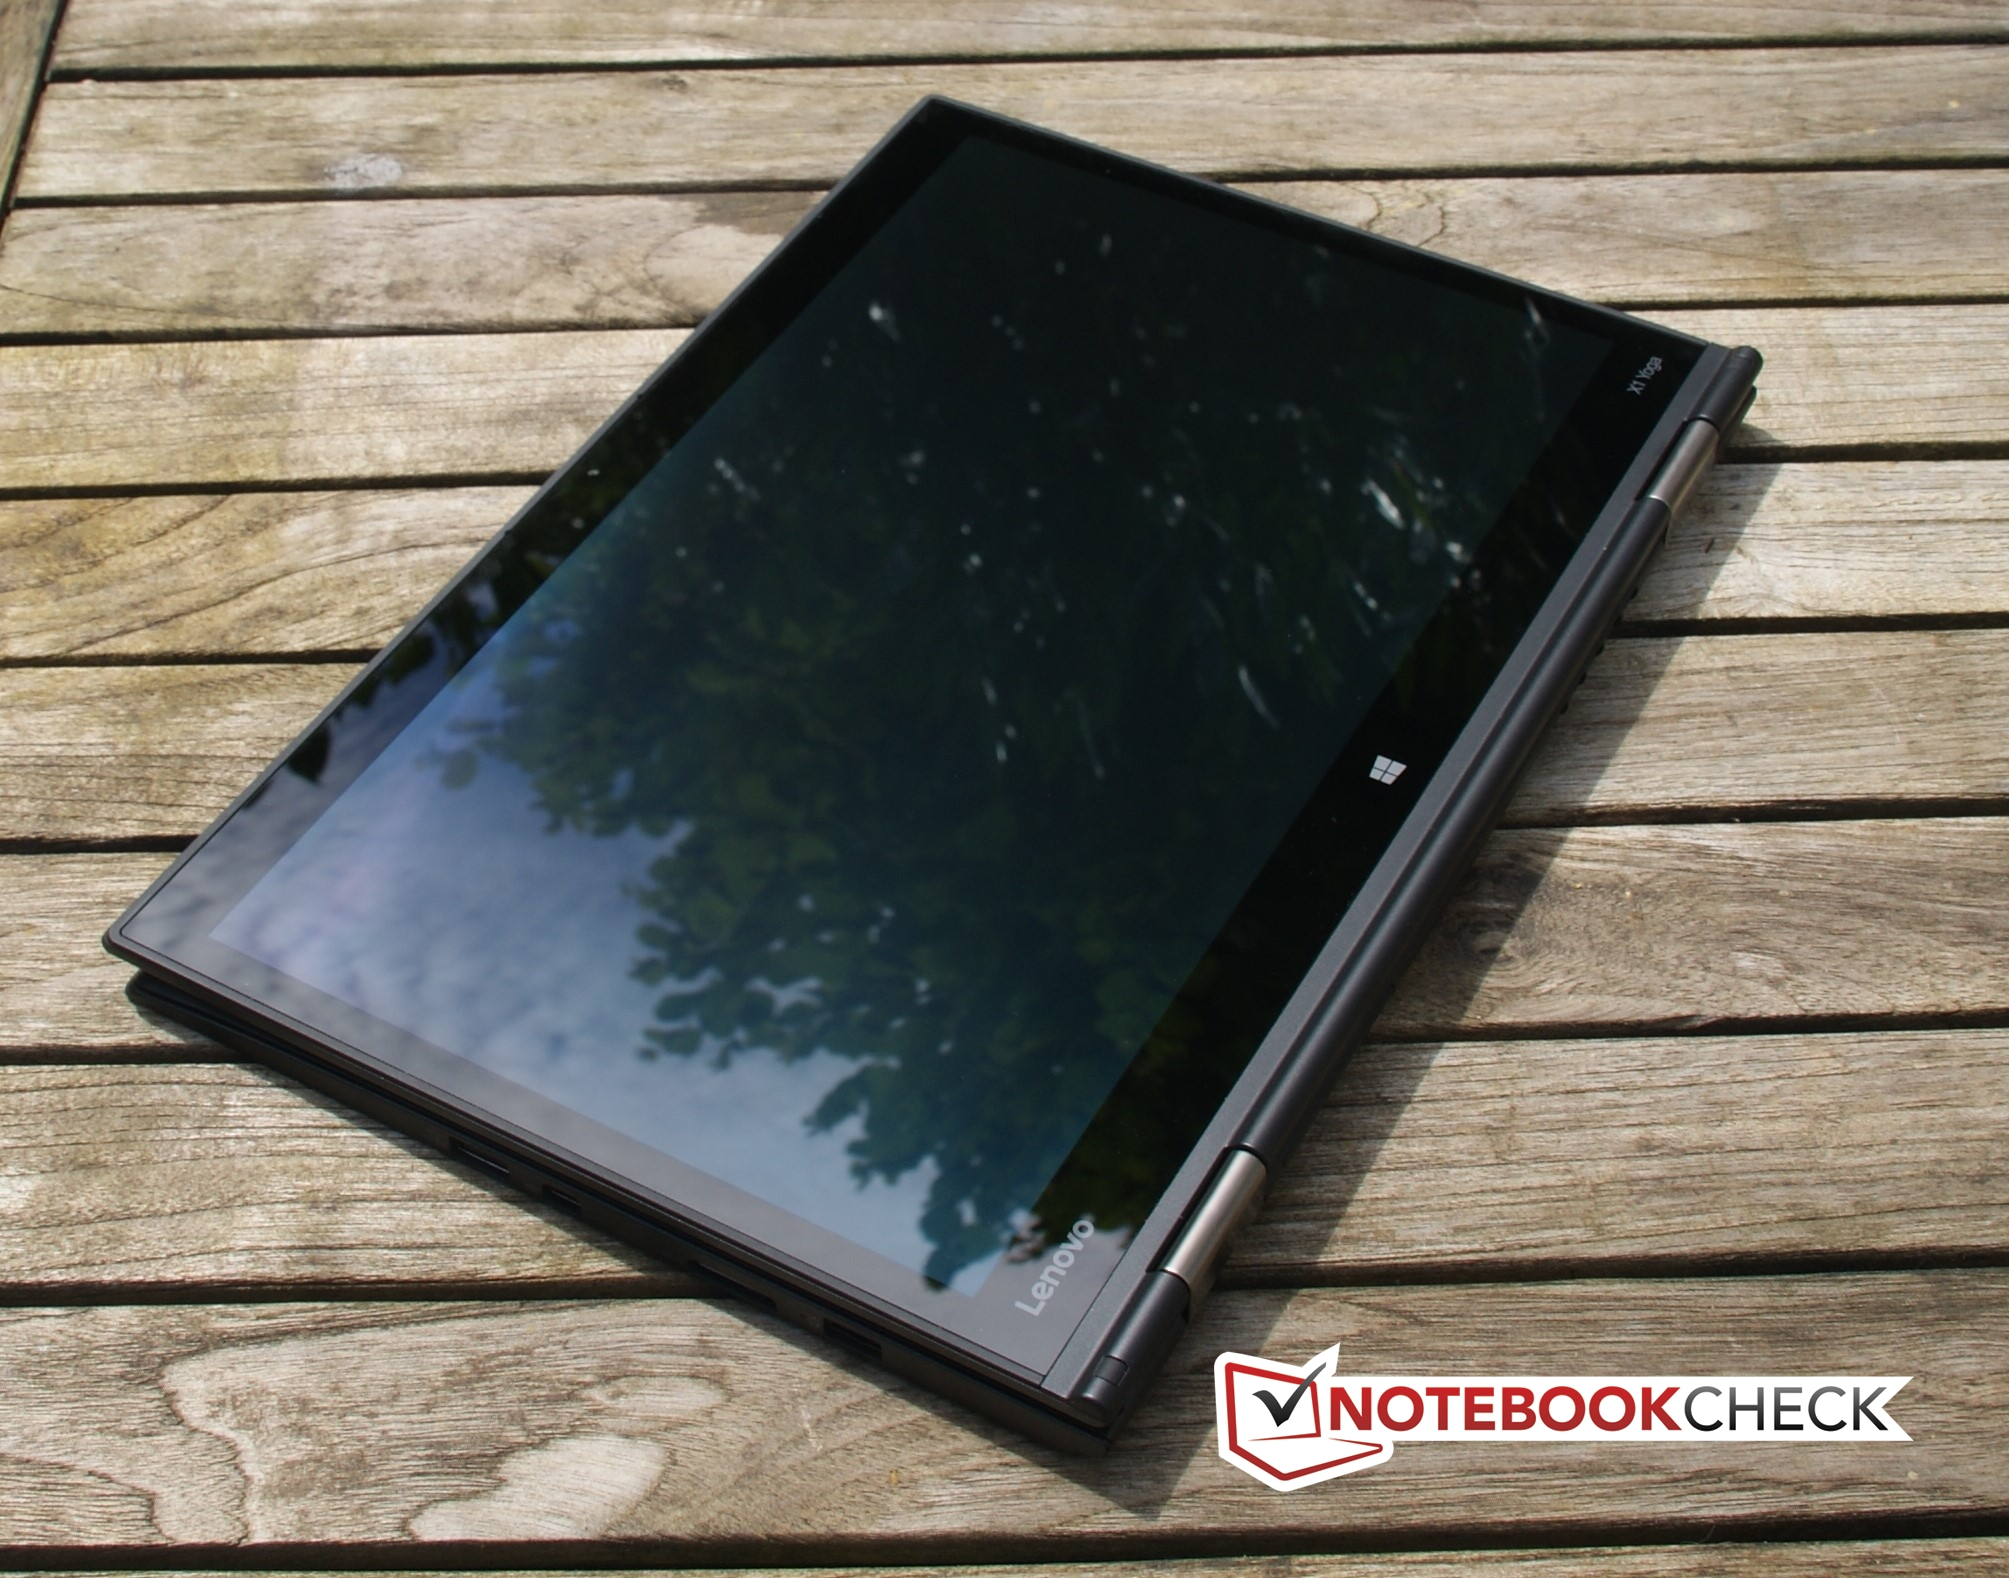 Lenovo ThinkPad X1 Yoga (OLED) Convertible Review